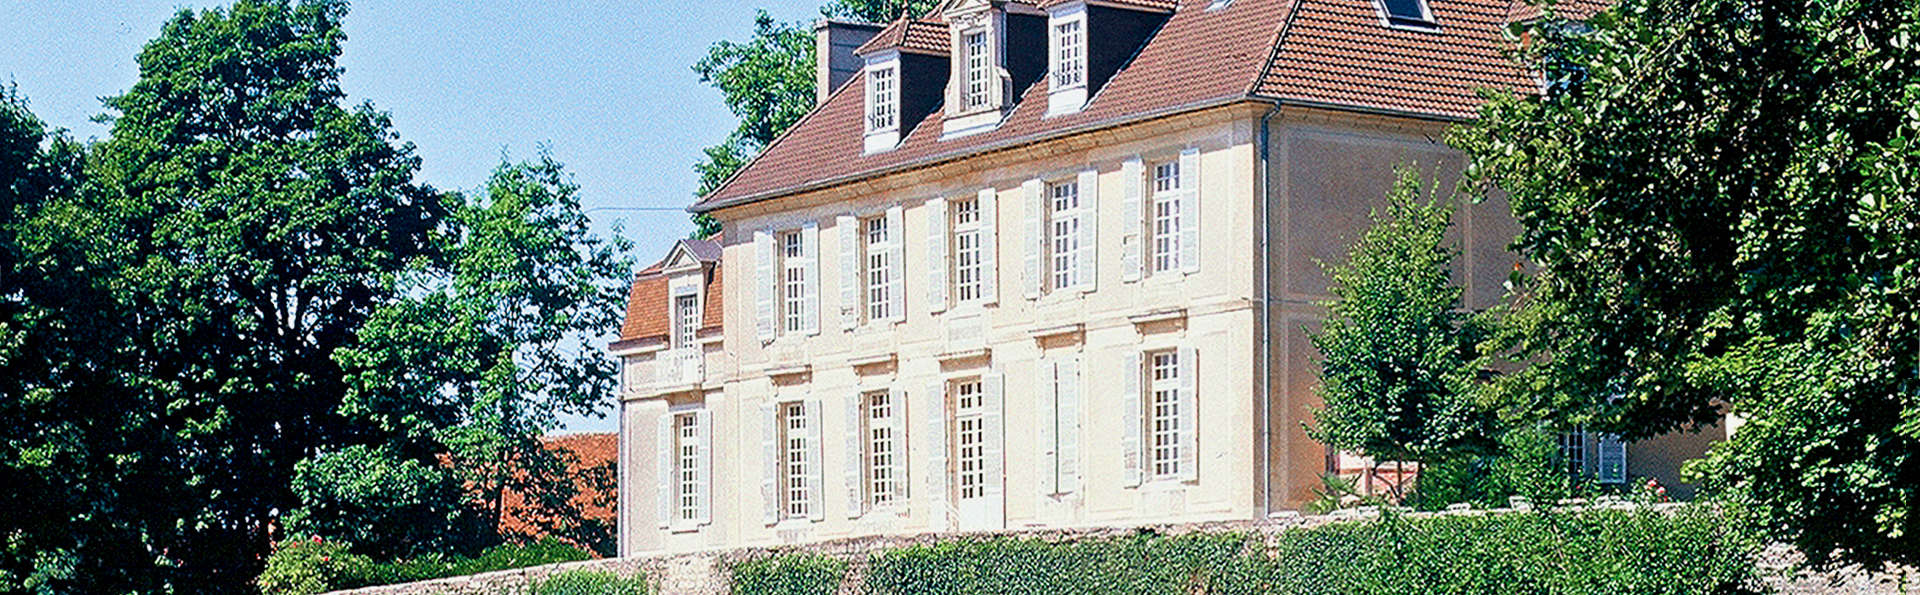 Château de Rigny  - EDIT_Fachada_1.jpg